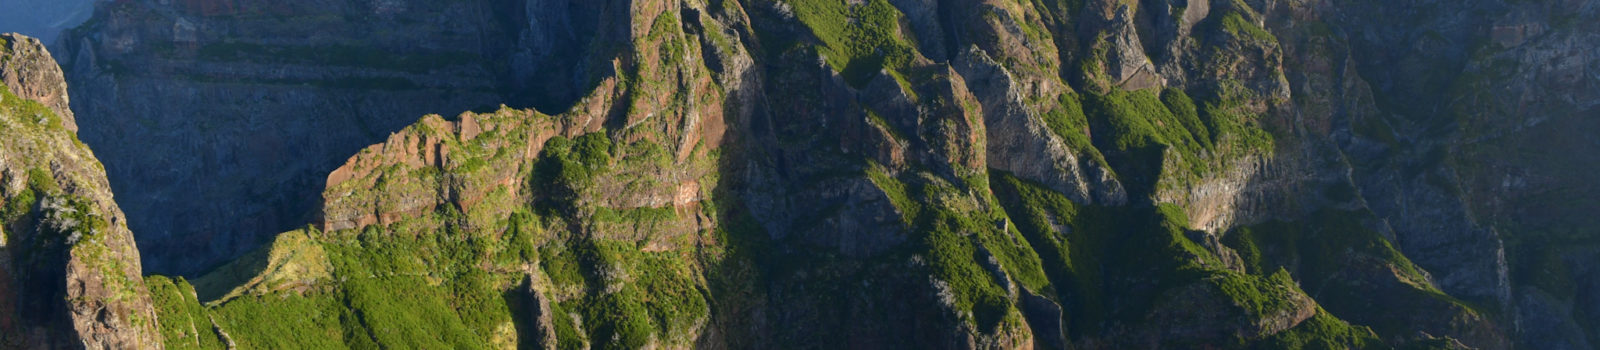 Madeira – Tag 2: Besteigung Pico Ruivo